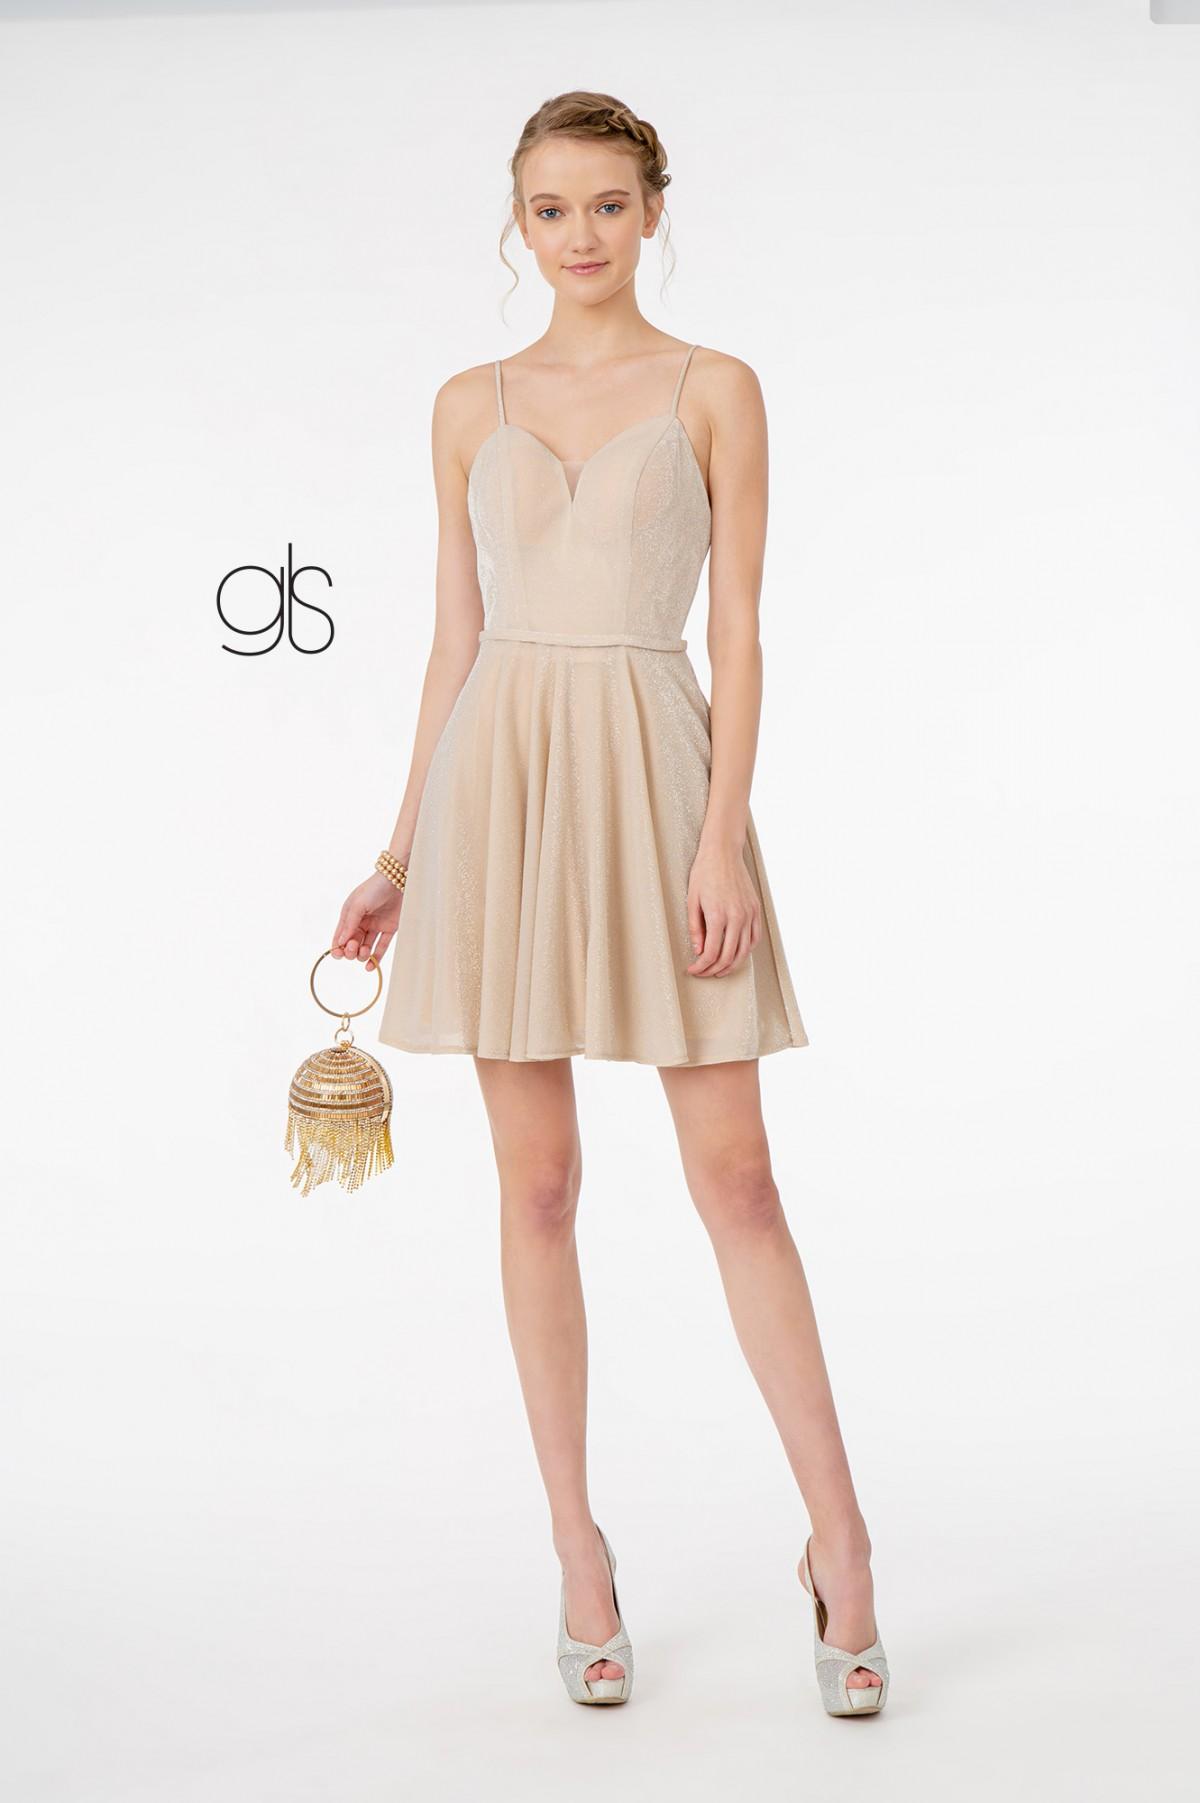 Sweetheart Neckline A-Line Short Dress w/ Pocket in Champagne